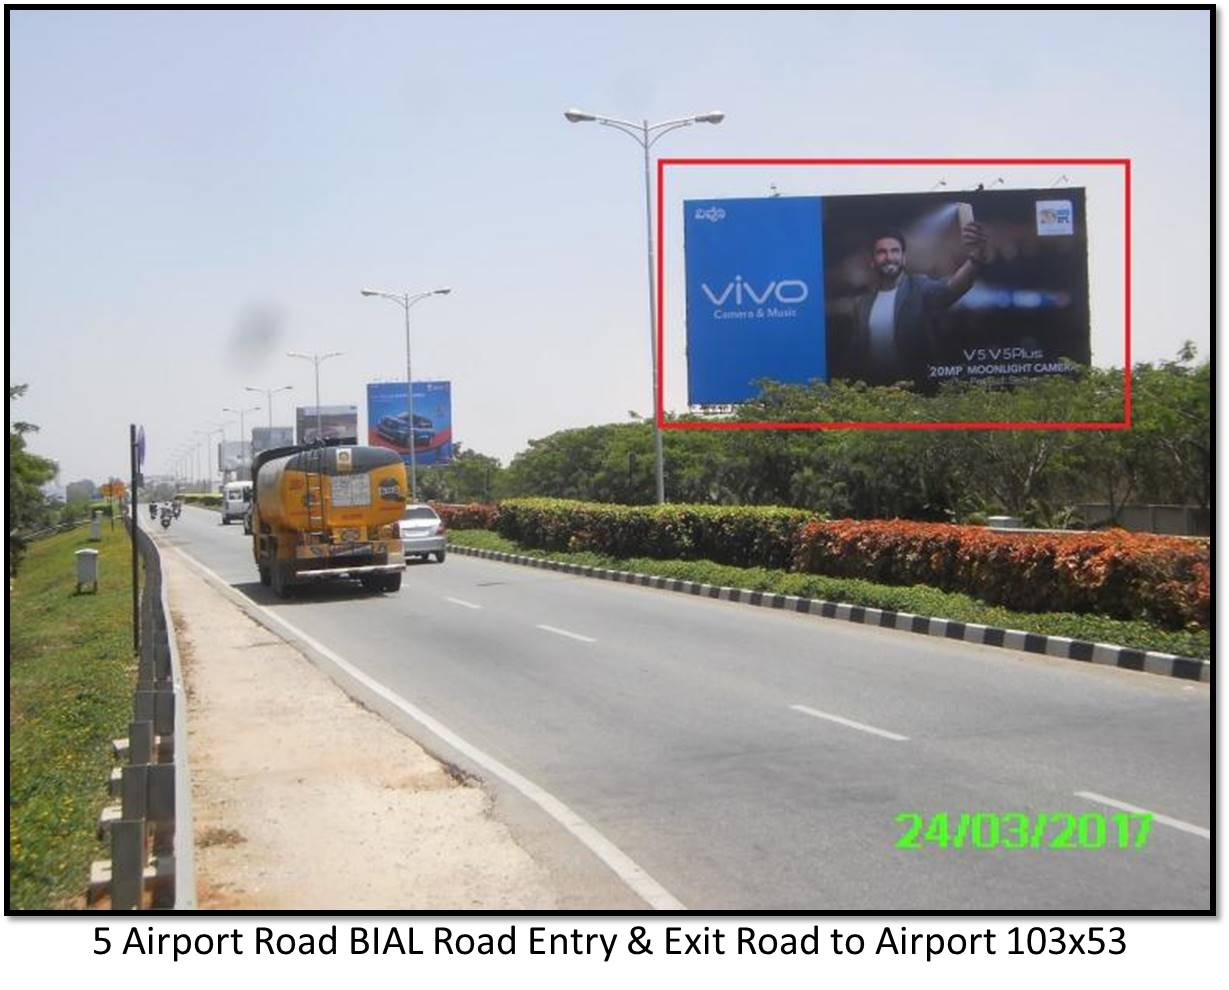 Airport Road BIAL Road Entry and Exit Road, Bengaluru